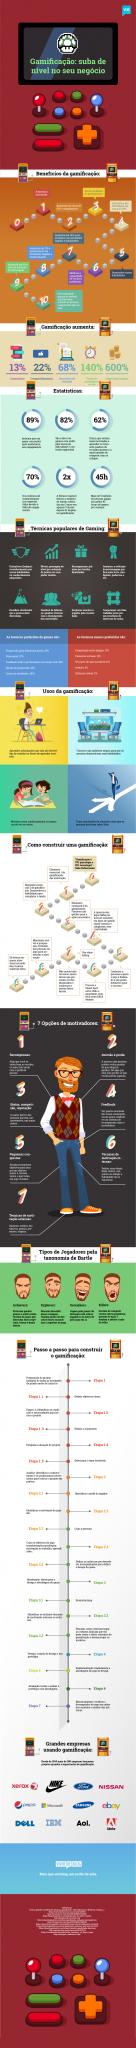 infografico-gamificacao